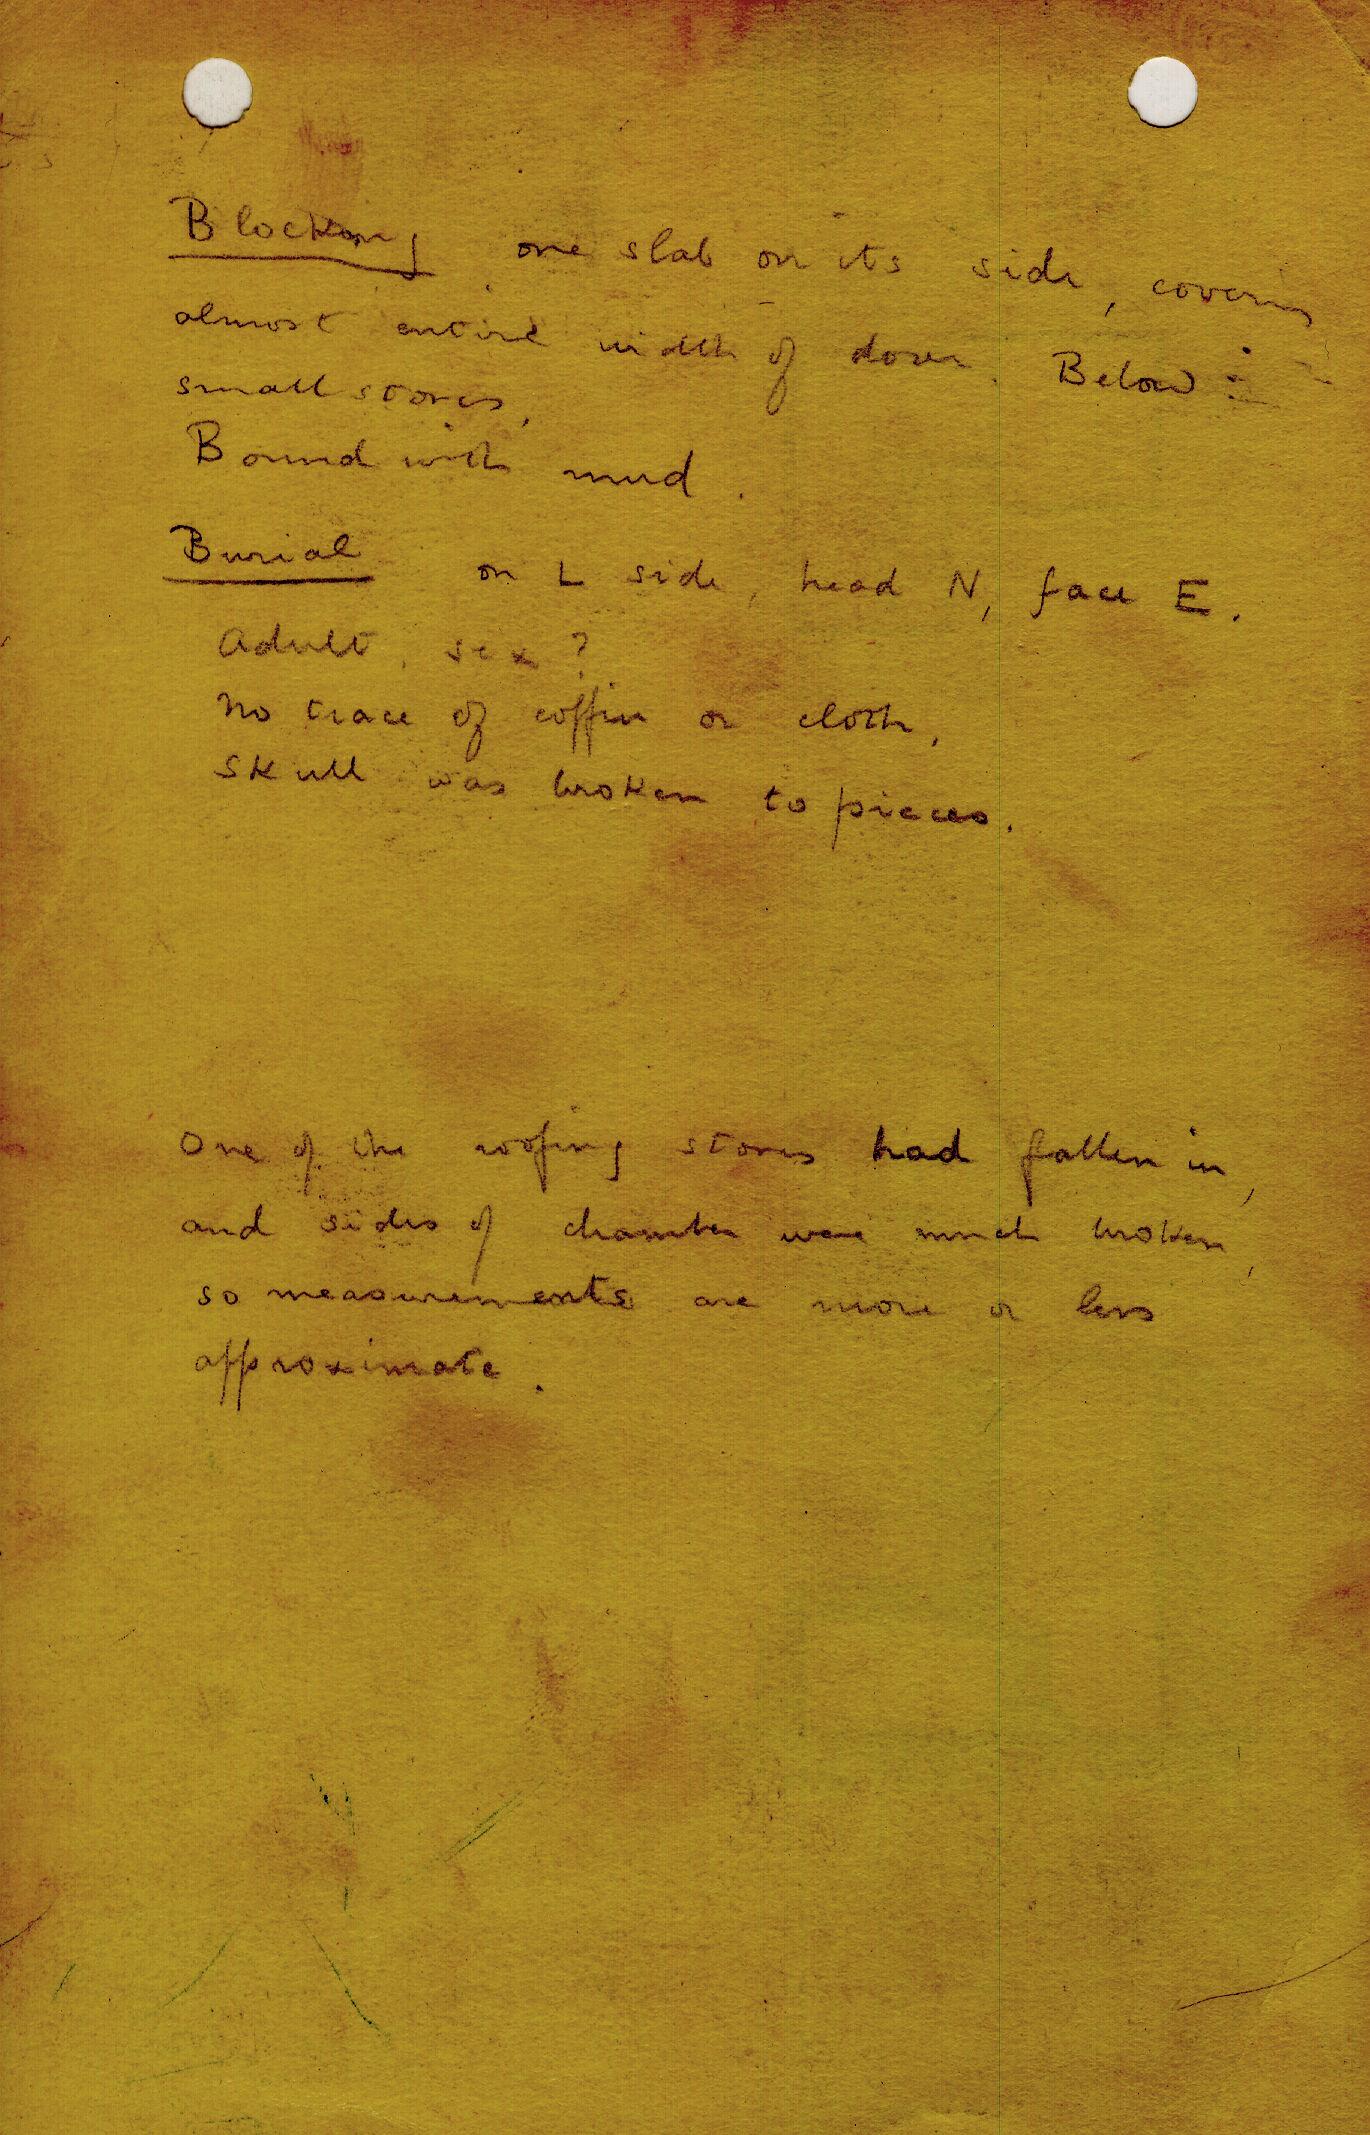 Notes: G 1311, Shaft D, notes